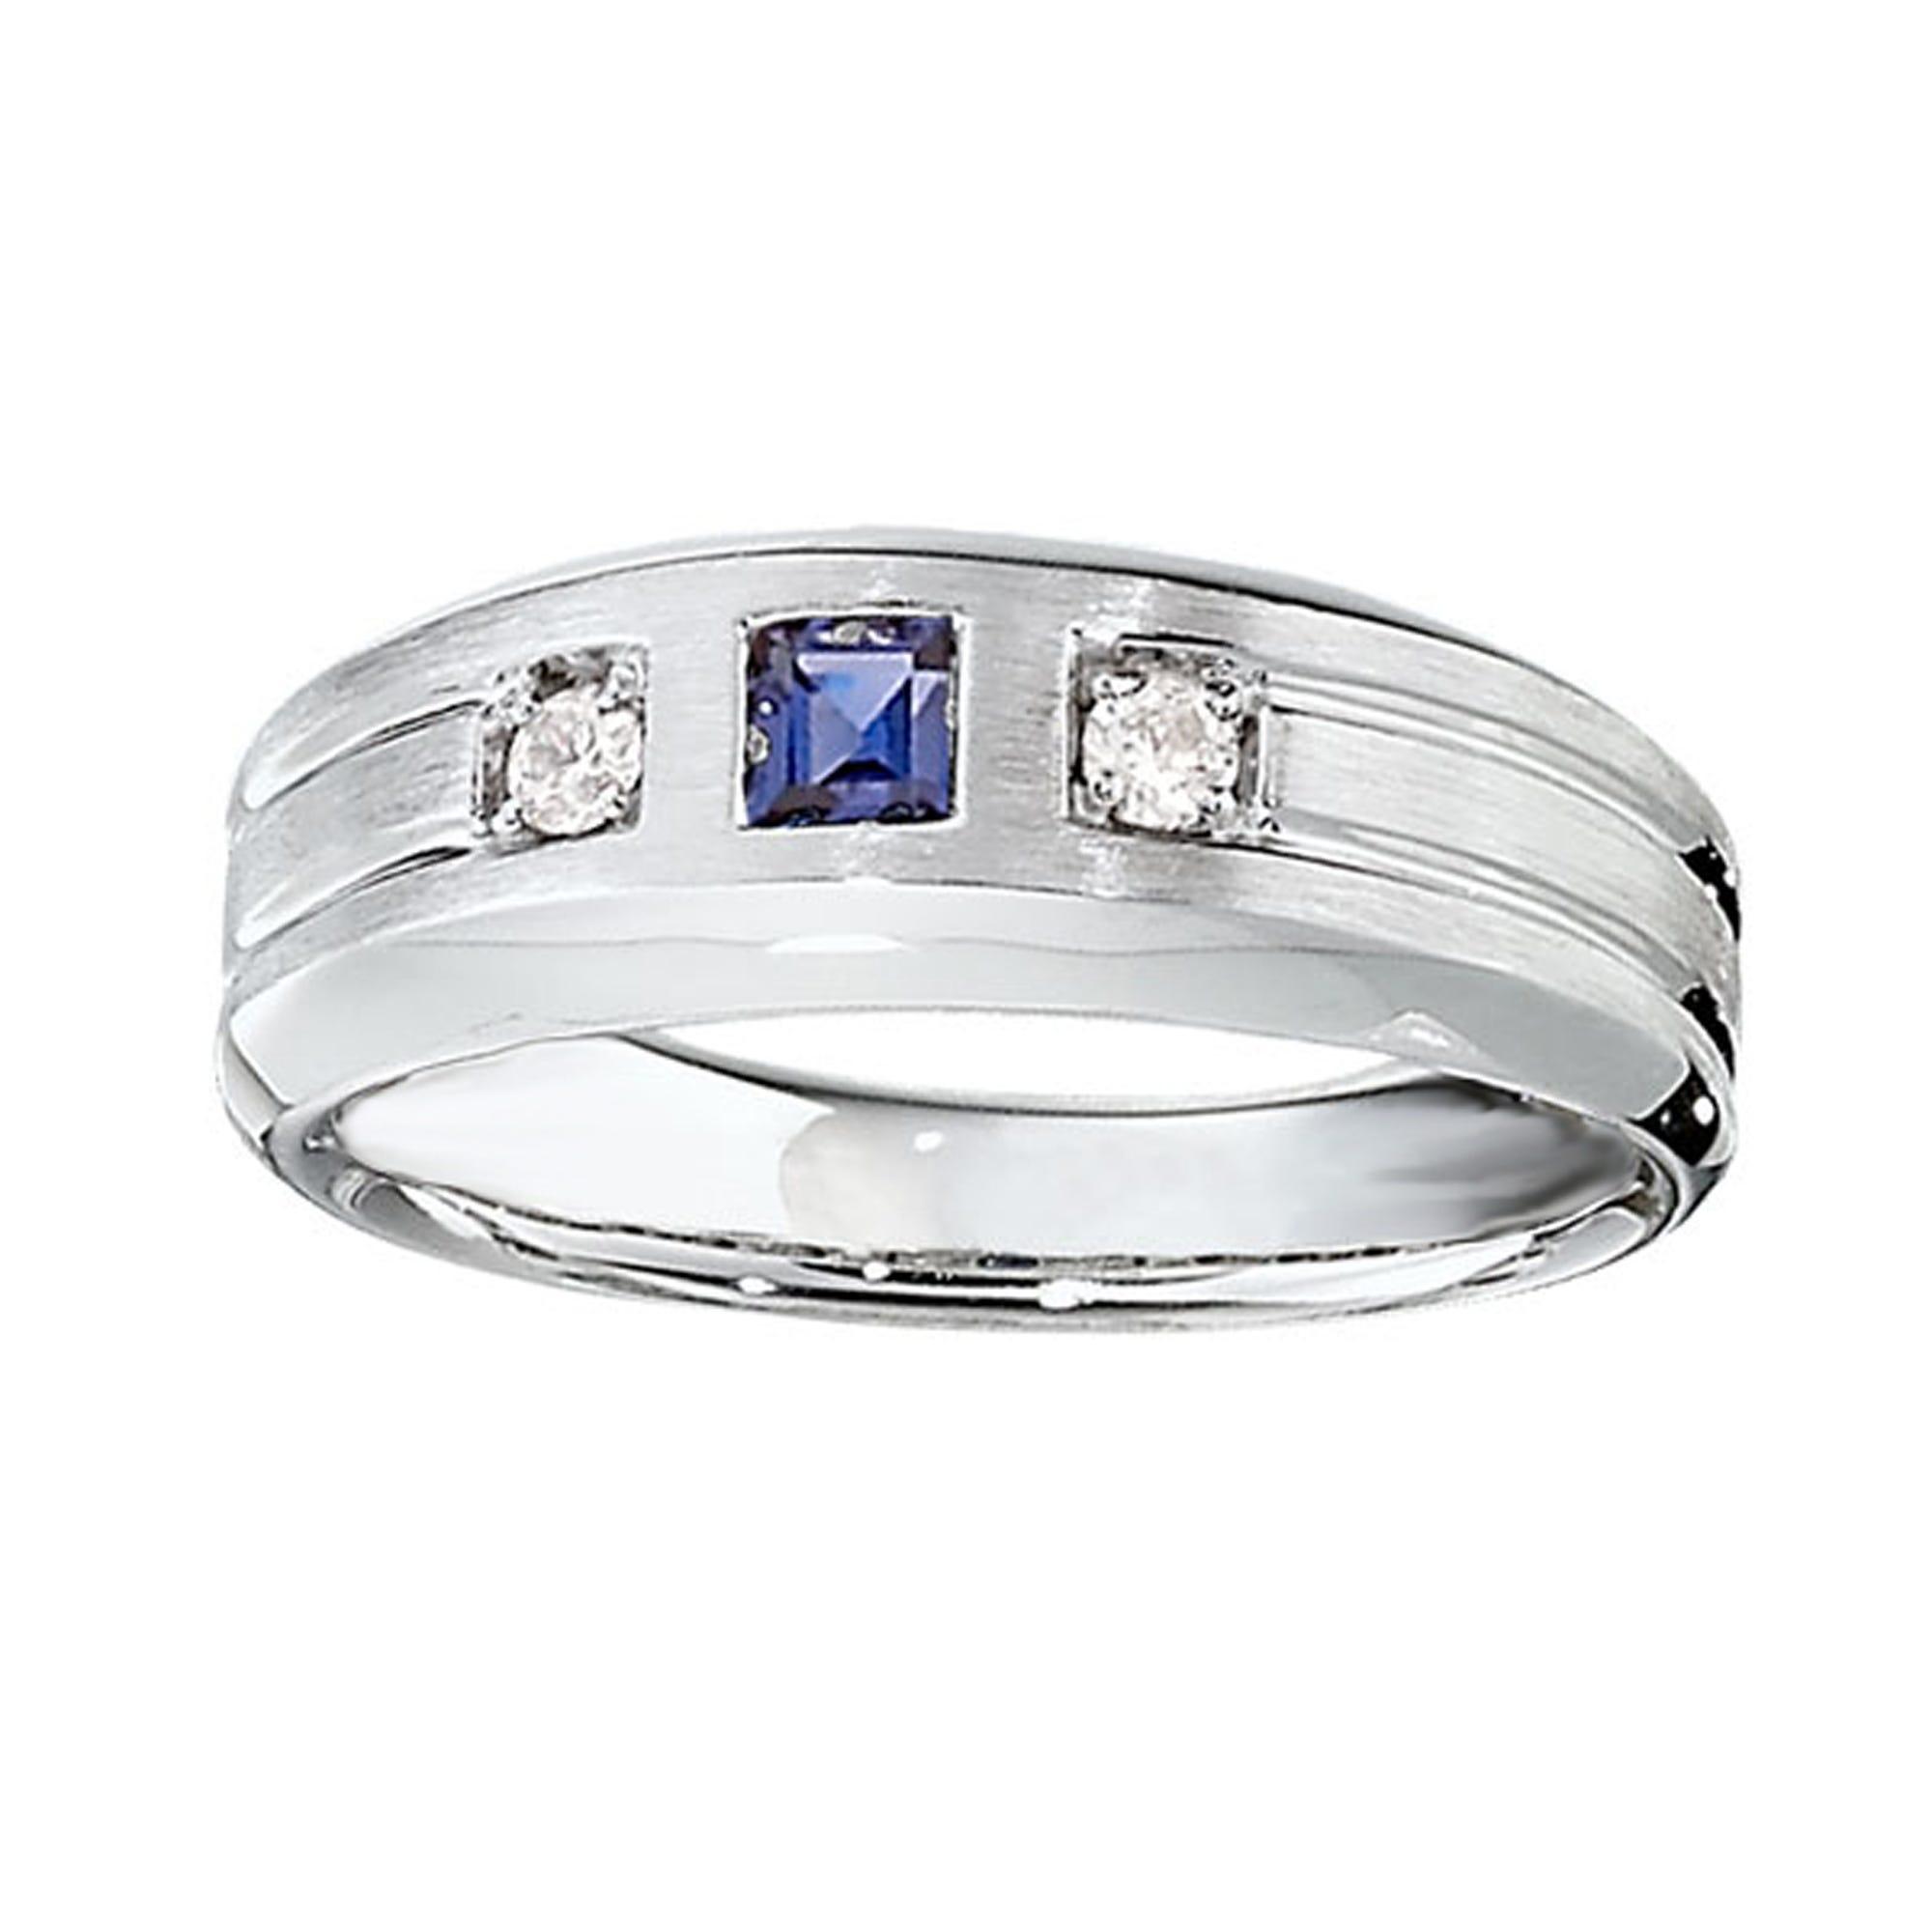 IBGoodman Men's 3-Stone Created Sapphire & Diamond Ring in Sterling Silver